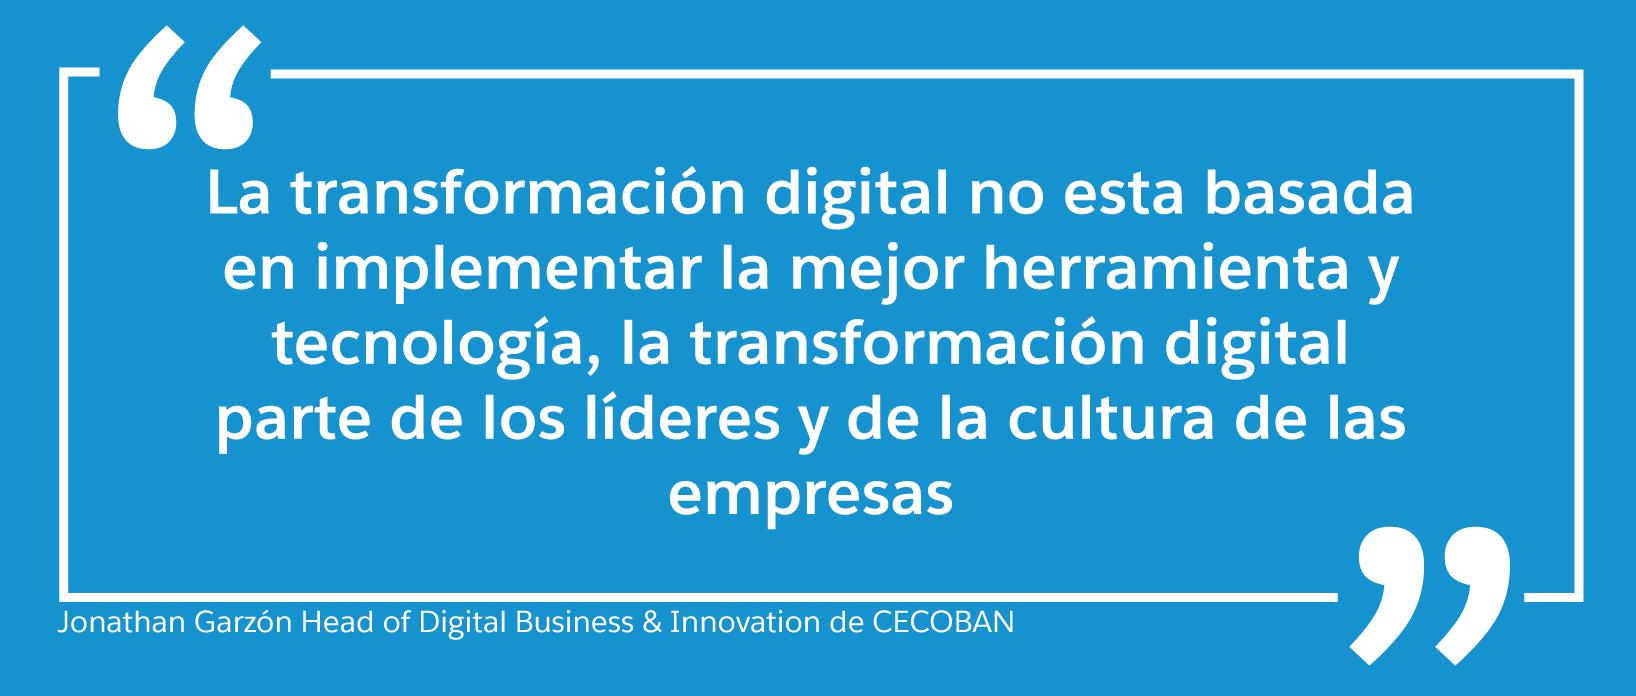 marketing-cloud-transformacion-digital-quote